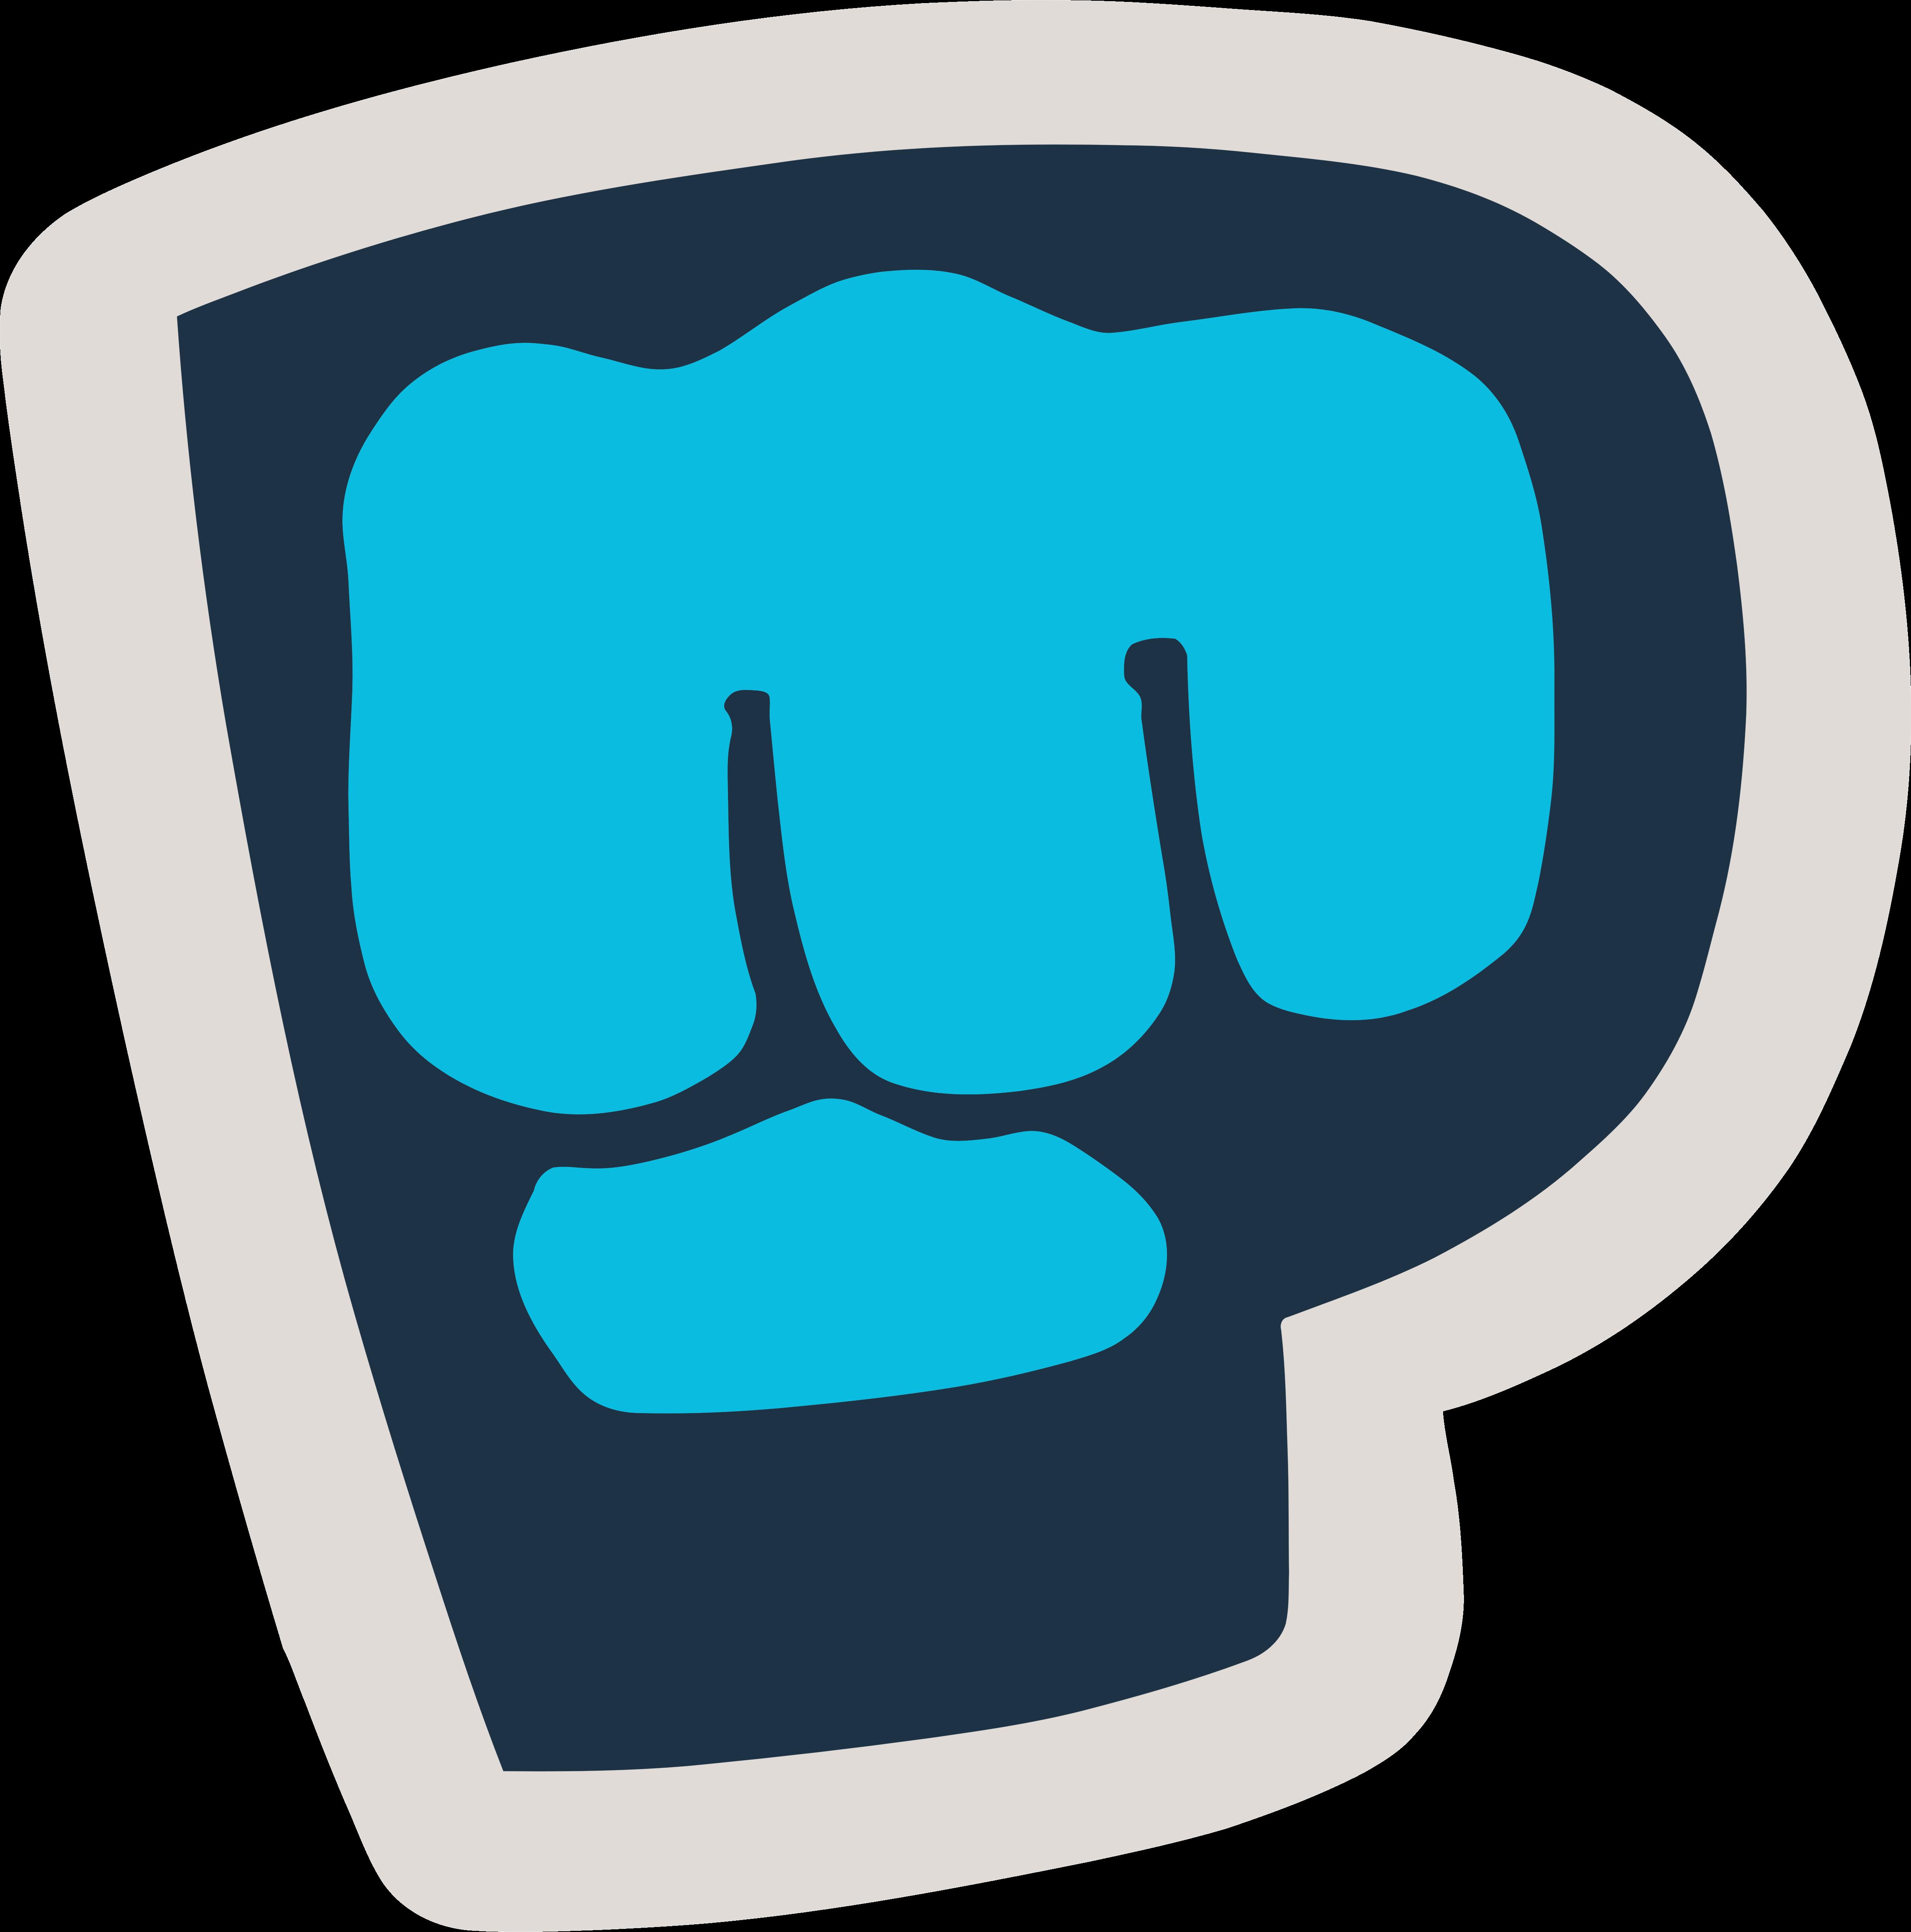 YouTube PewDiePie Logo Design